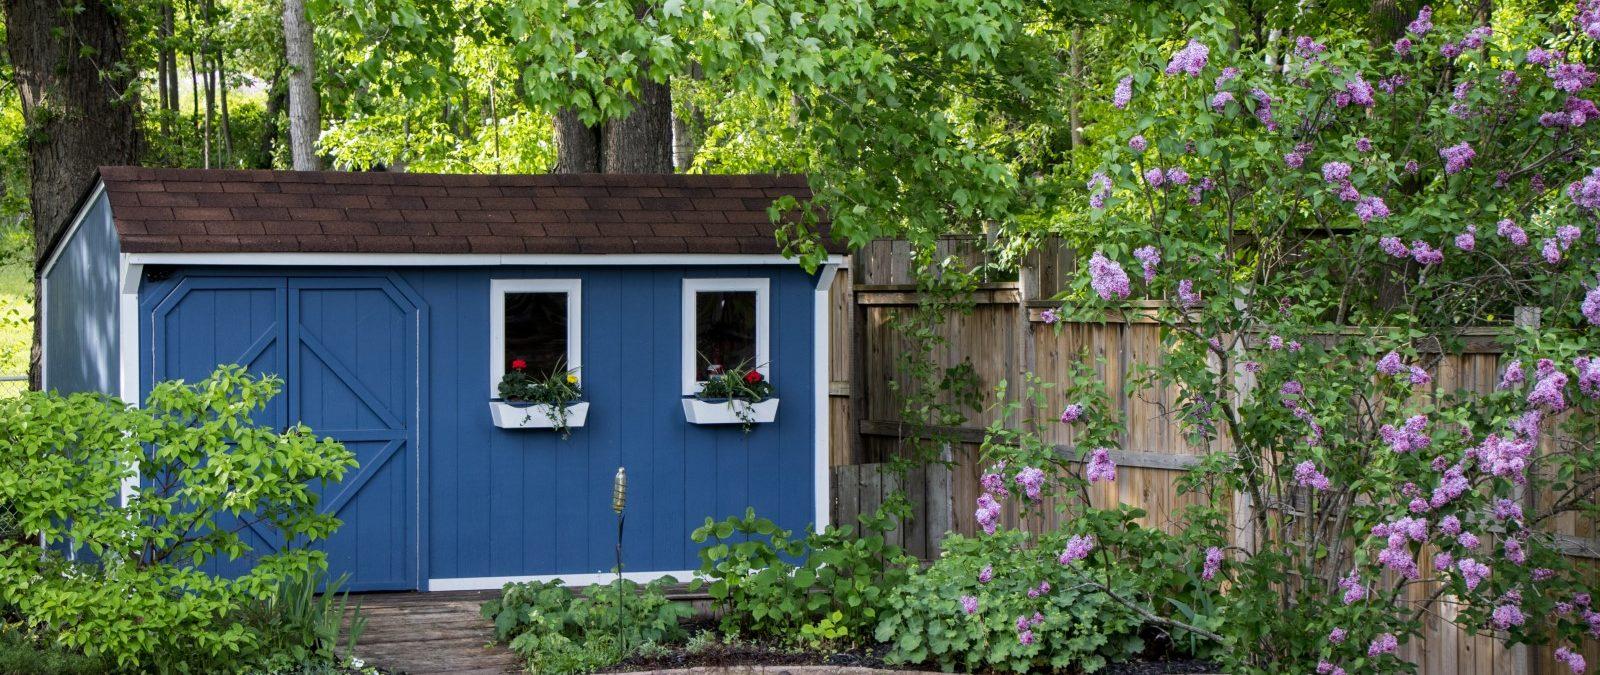 garden shed guide